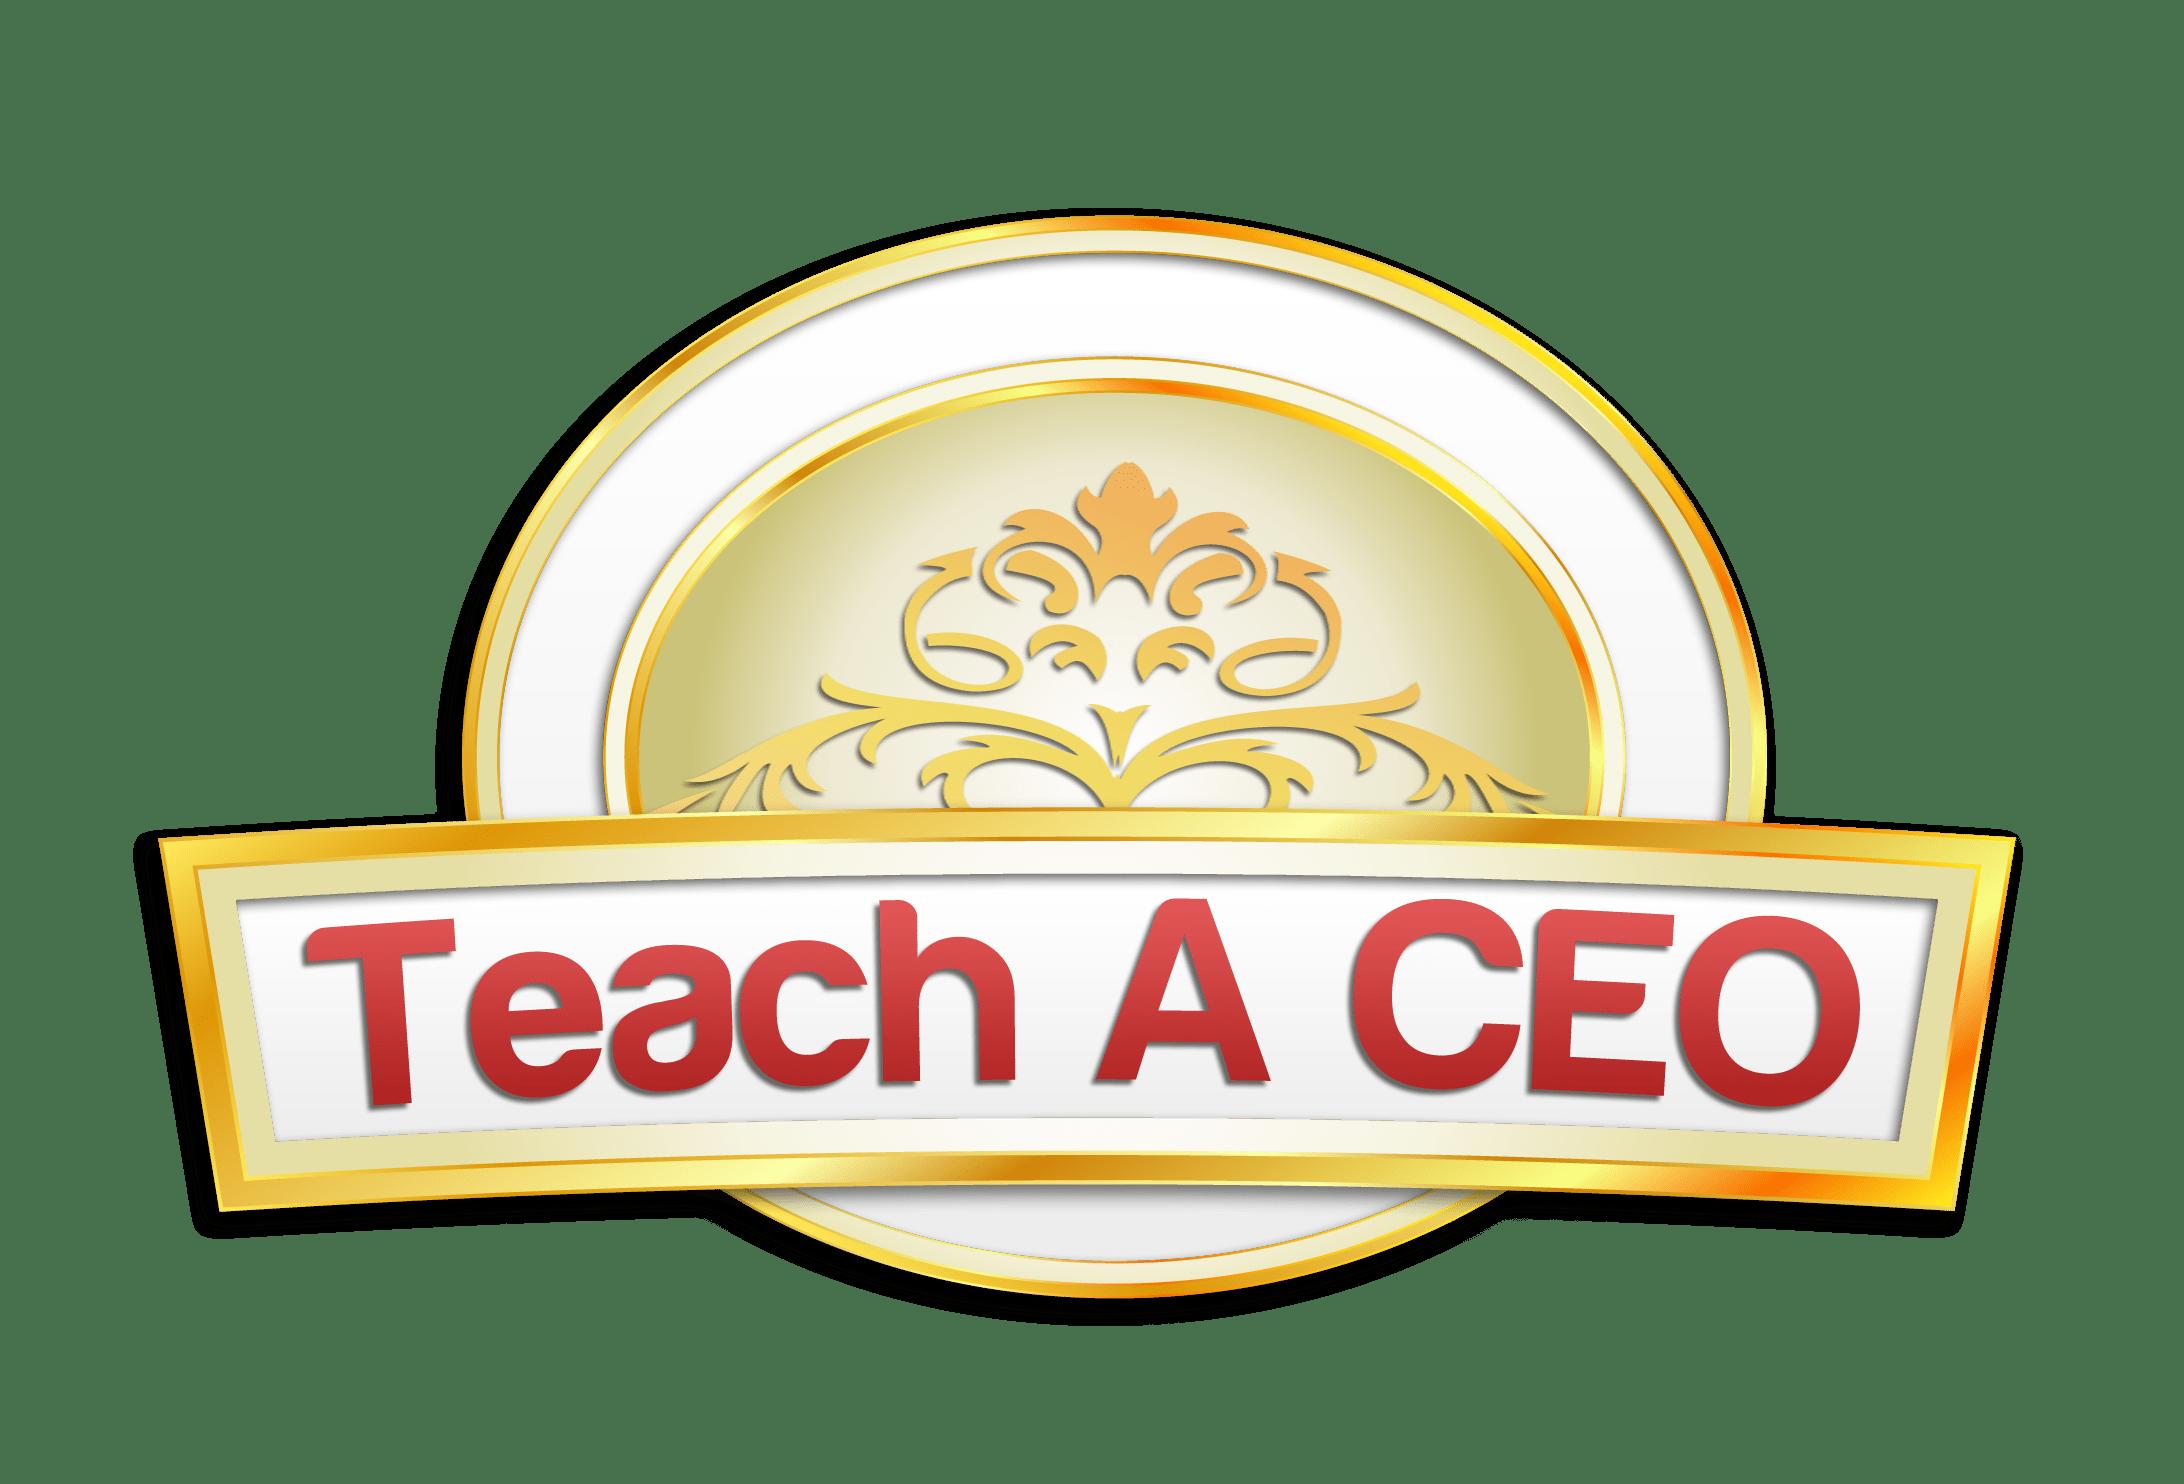 Social Media Marketing Plans [INFOGRAPHIC] – Teach a CEO